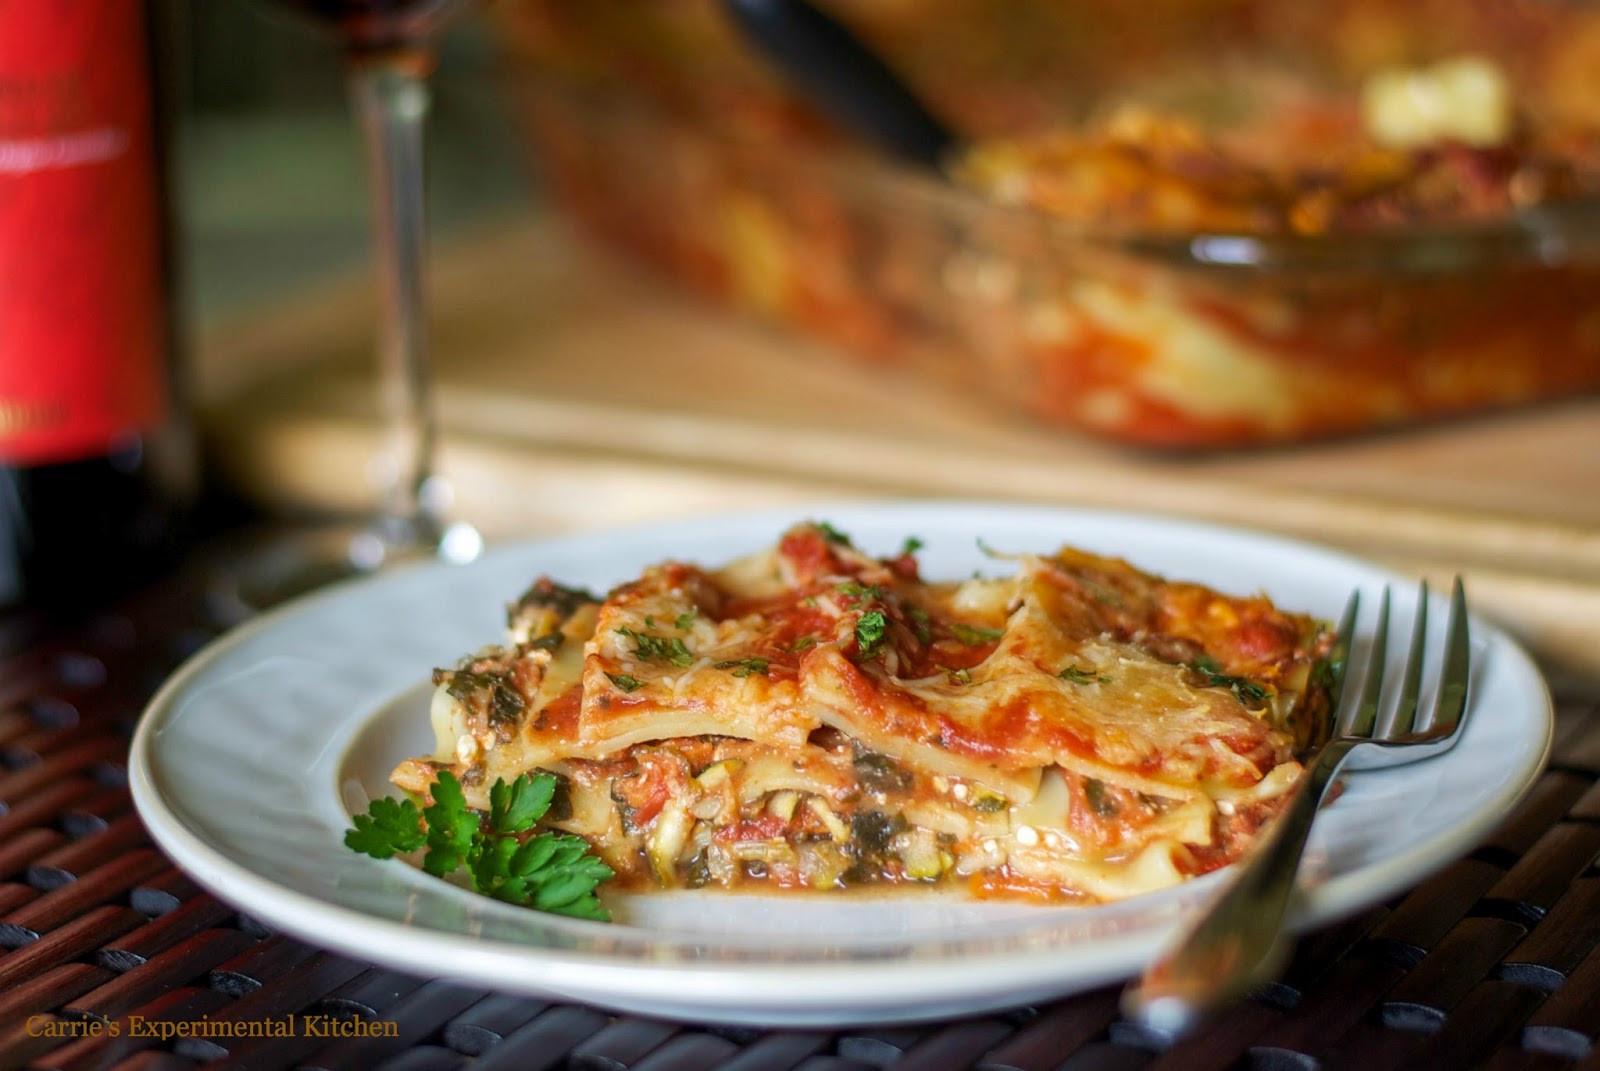 Low Fat Lasagna  Low Fat Ve able Lasagna Carrie's Experimental Kitchen